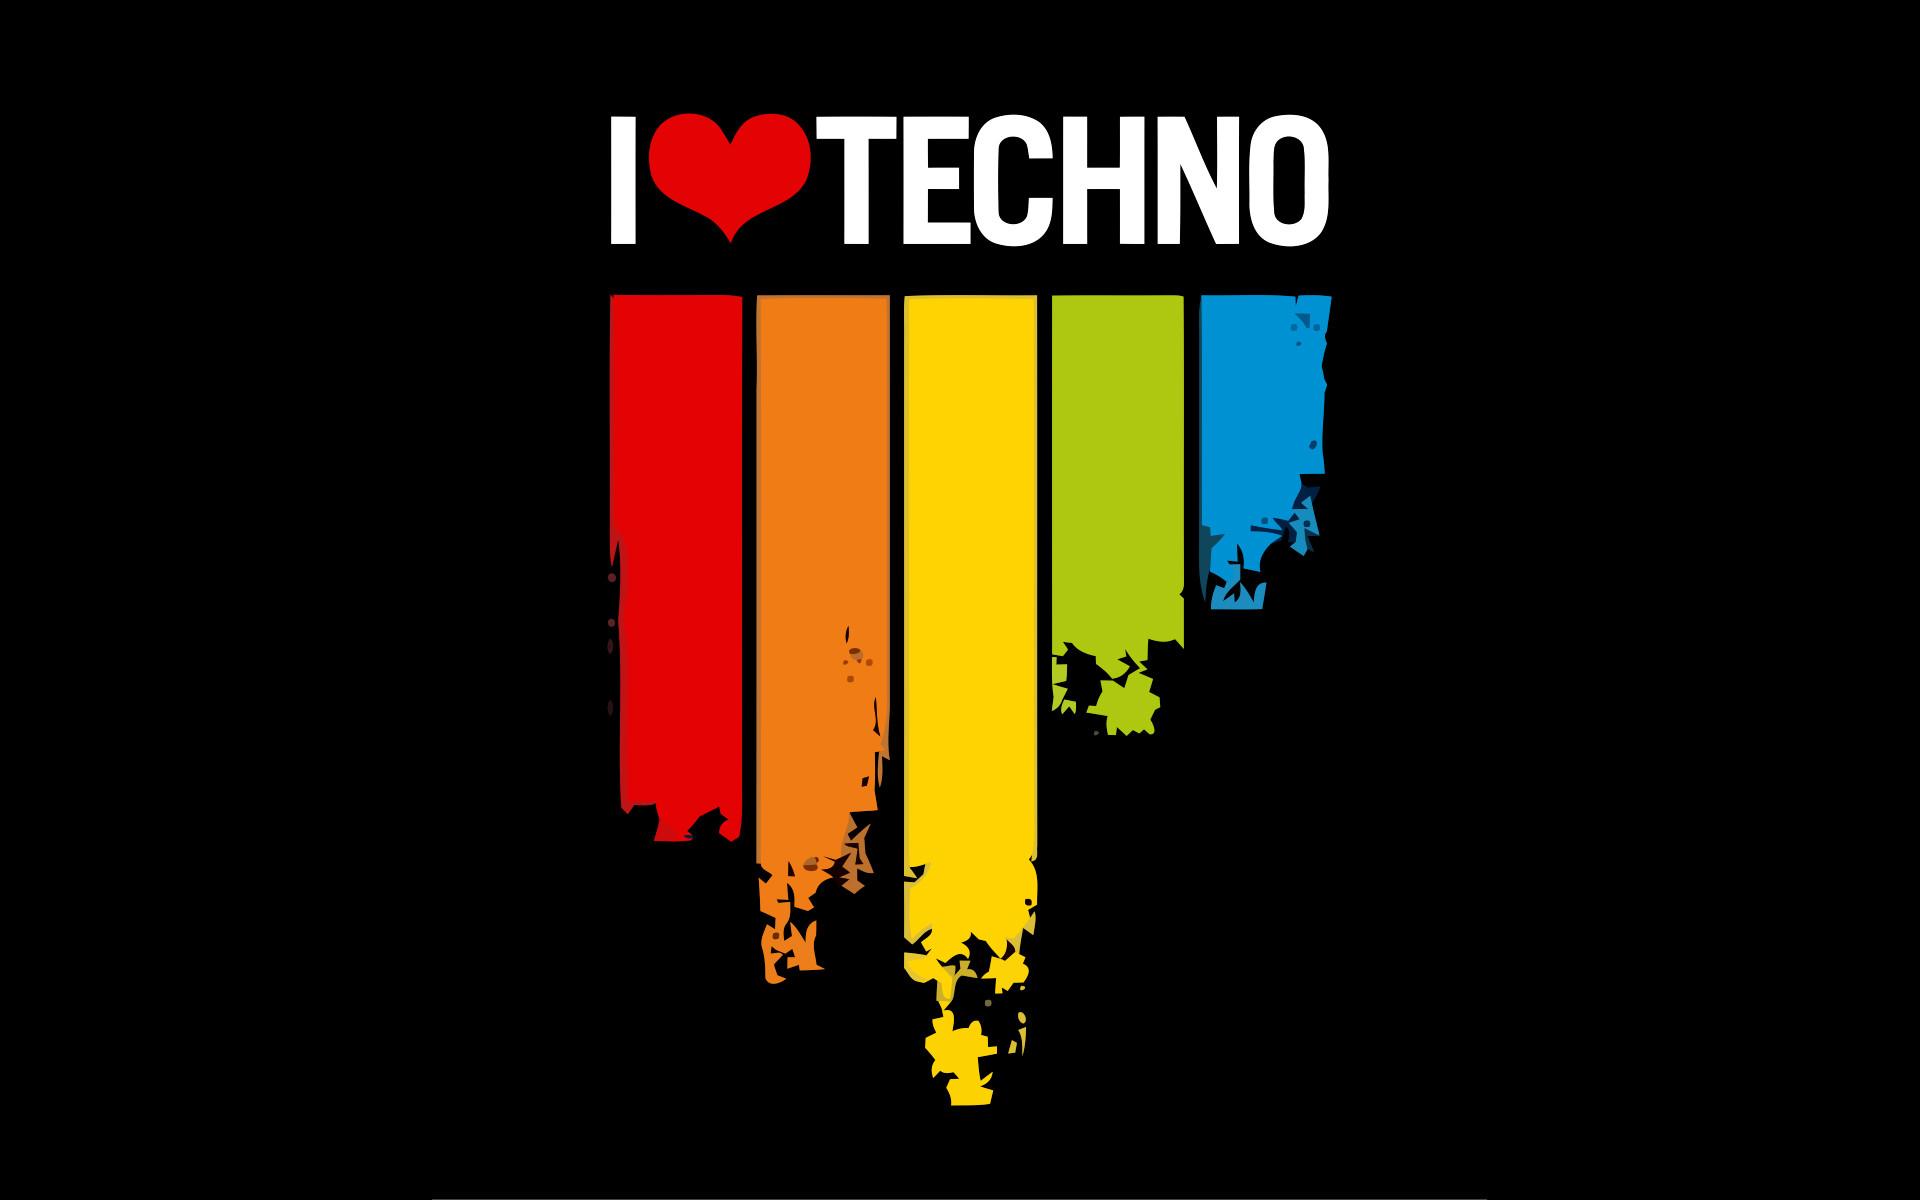 Red Techno Background | wallpaper, wallpaper hd .